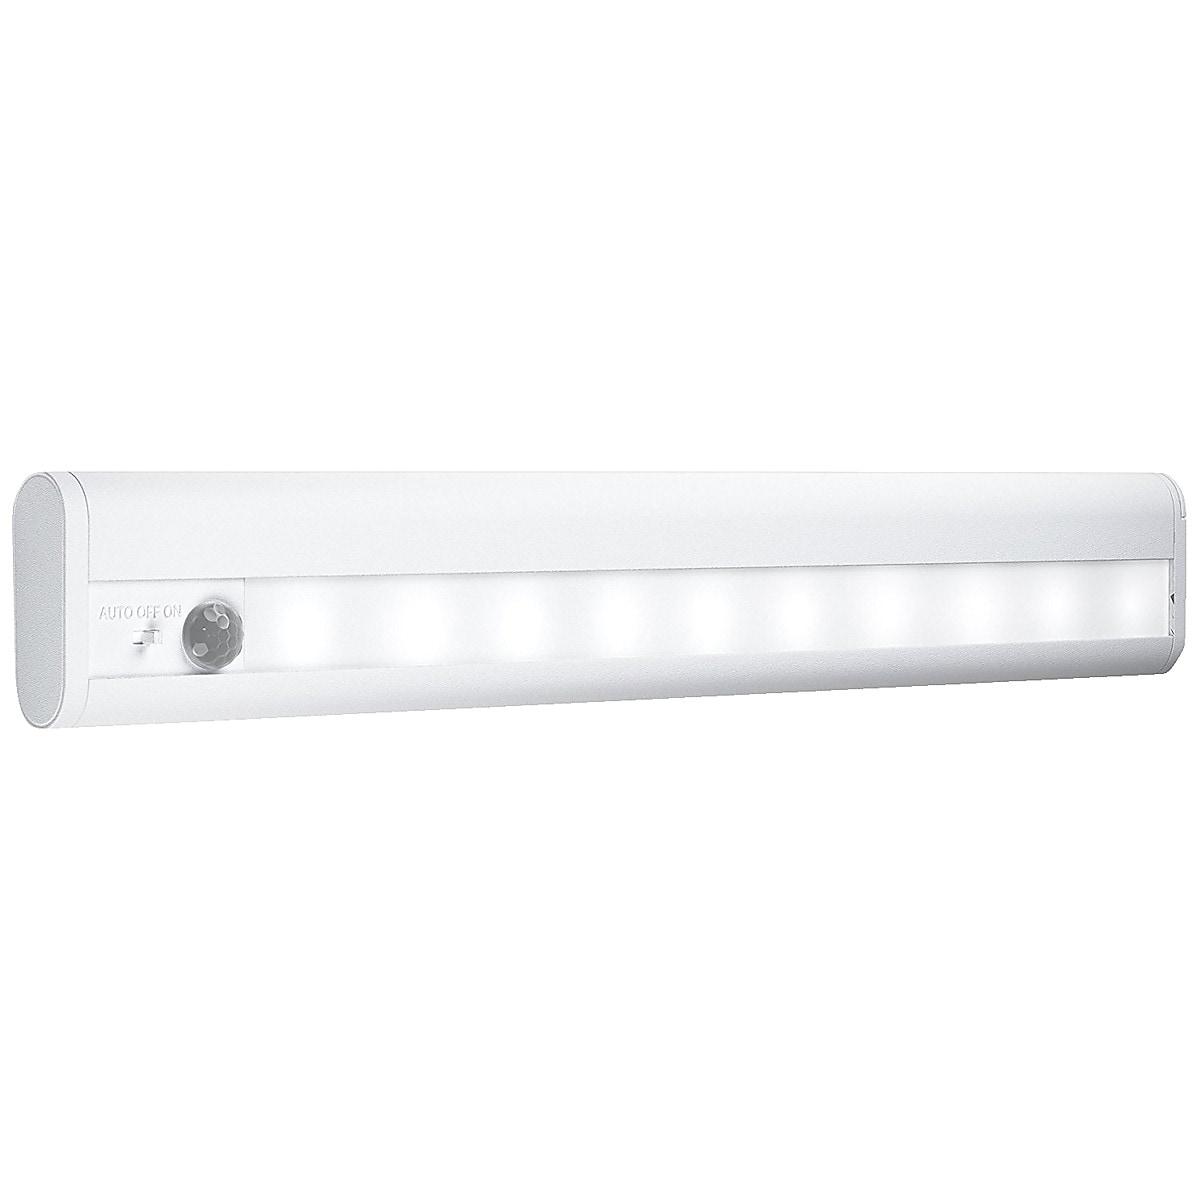 LED-Beleuchtung LinearLED 300 mit Bewegungsmelder, Ledvance